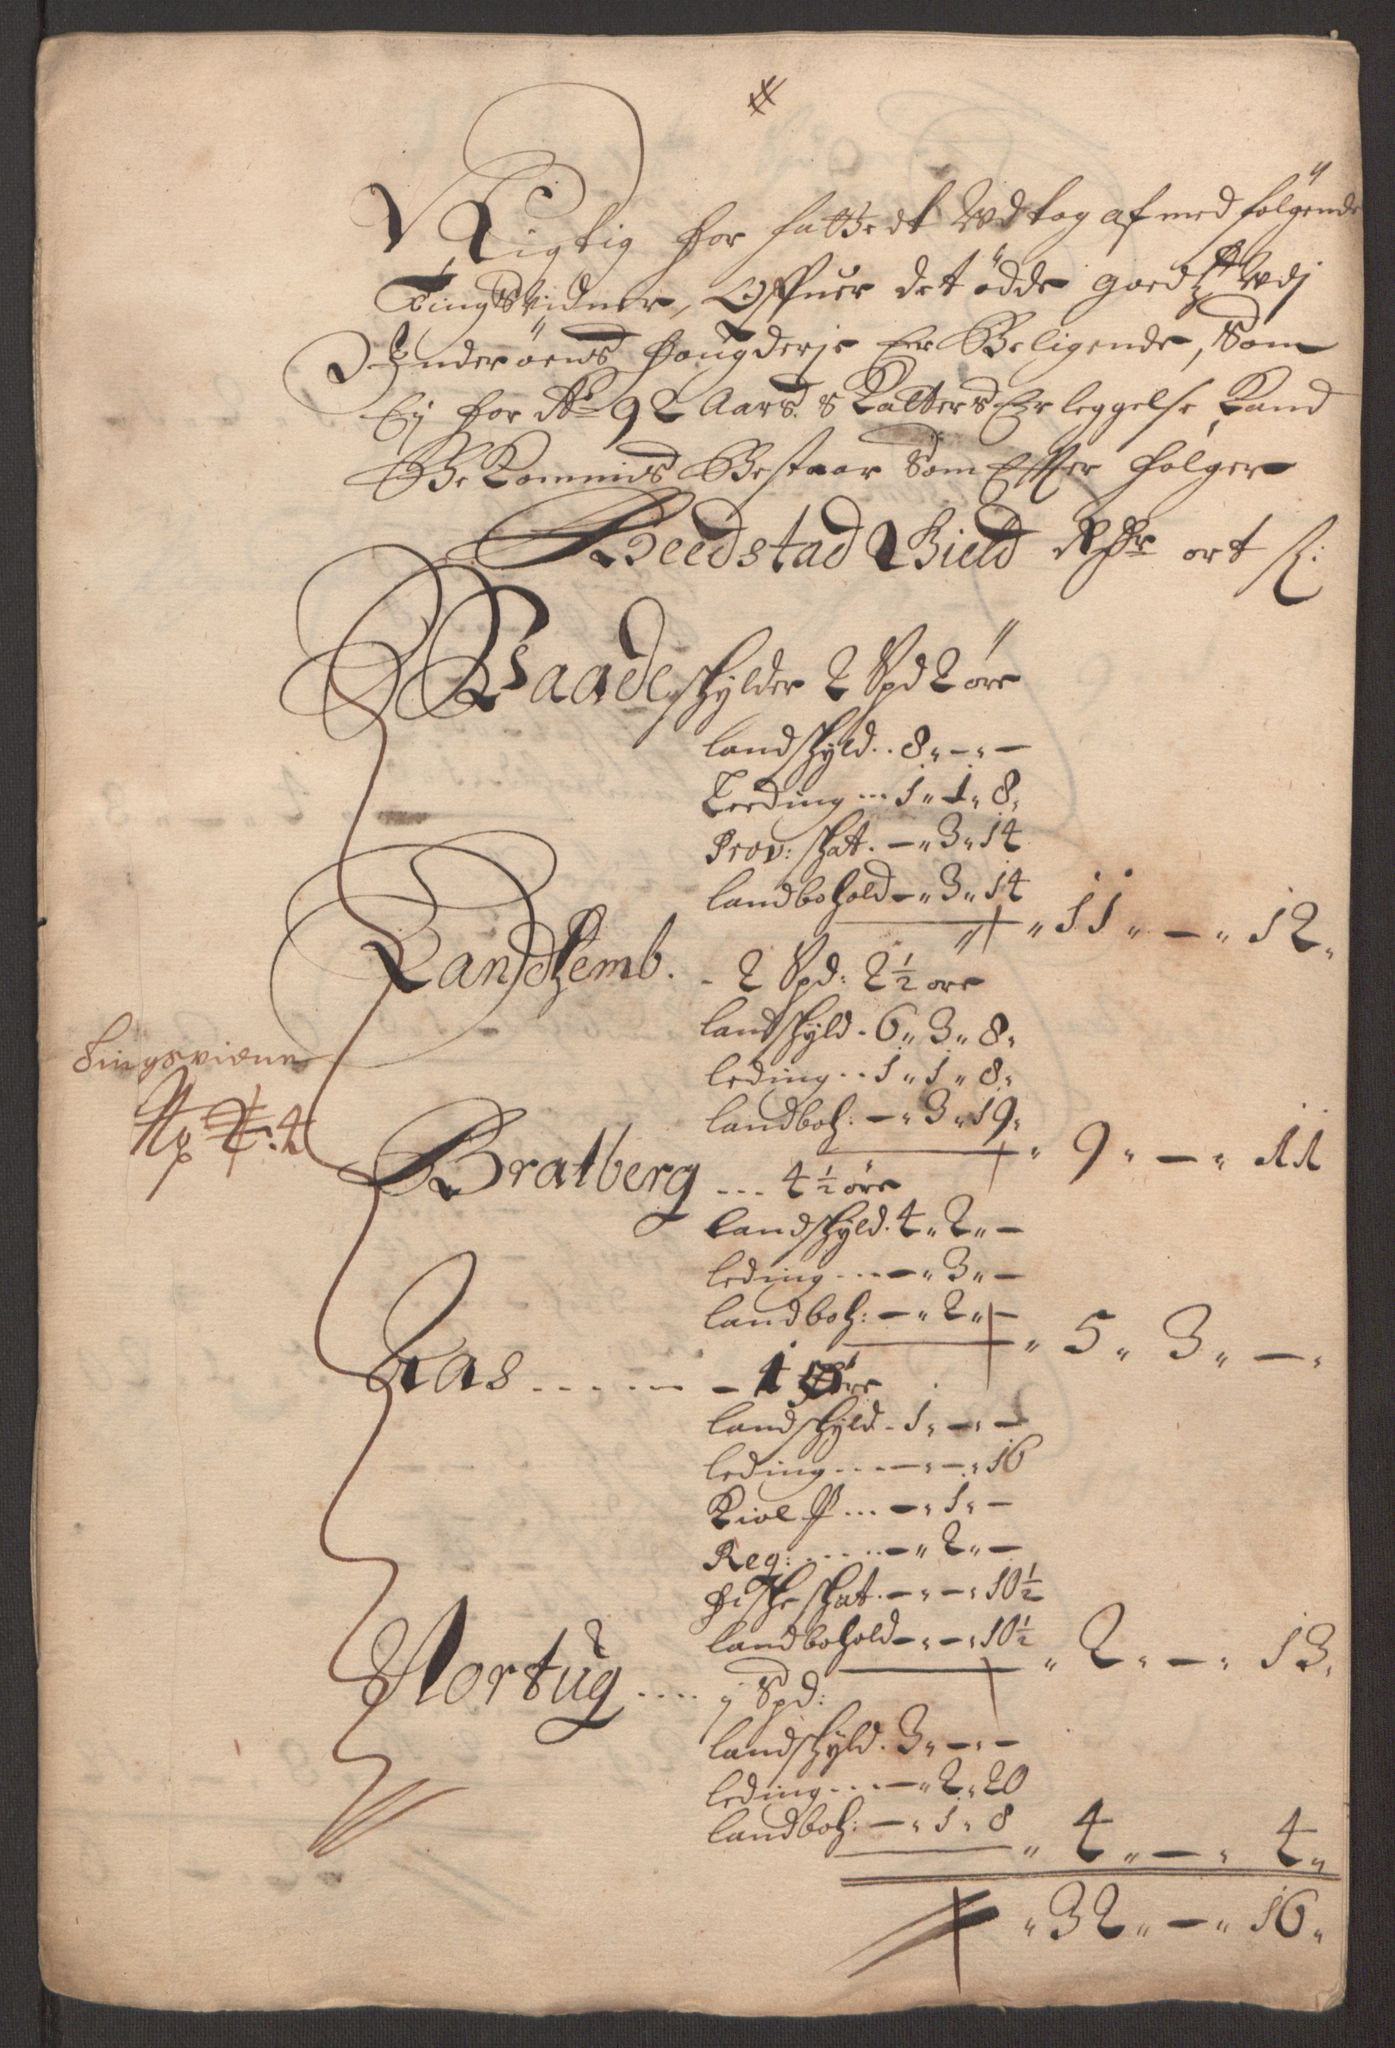 RA, Rentekammeret inntil 1814, Reviderte regnskaper, Fogderegnskap, R63/L4308: Fogderegnskap Inderøy, 1692-1694, s. 221